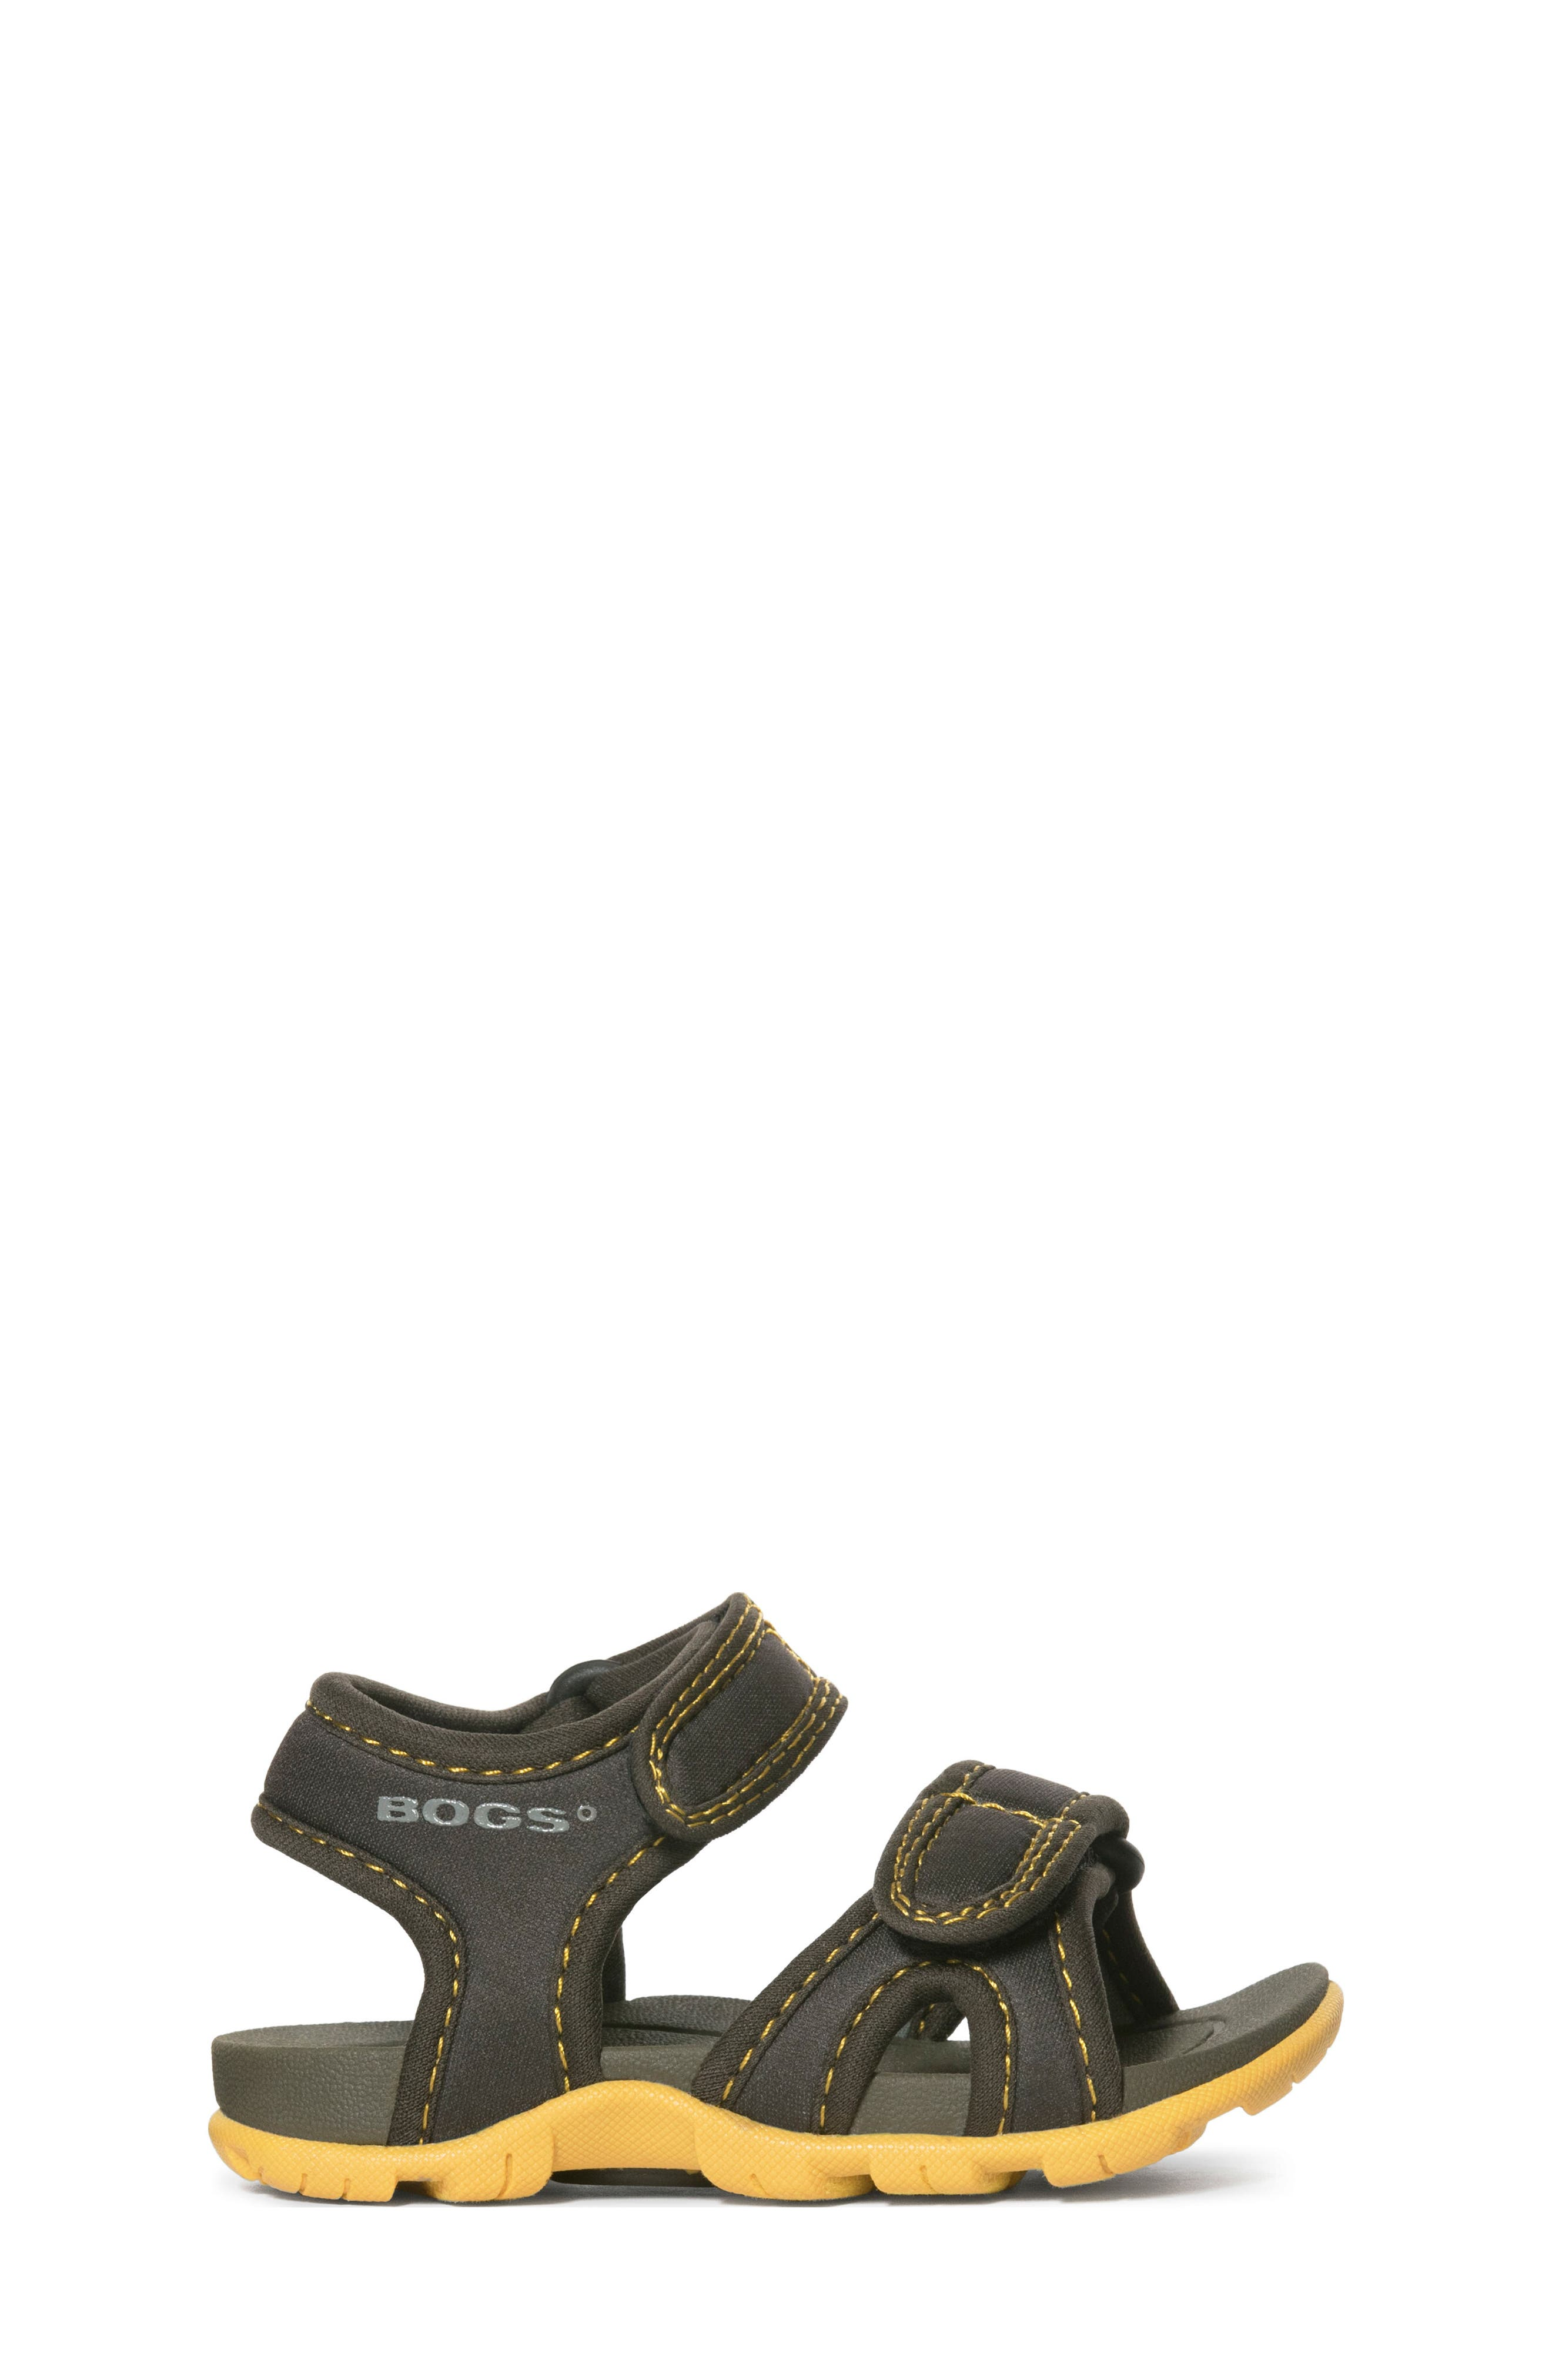 Whitefish Waterproof Sandal,                             Alternate thumbnail 3, color,                             Olive Multi